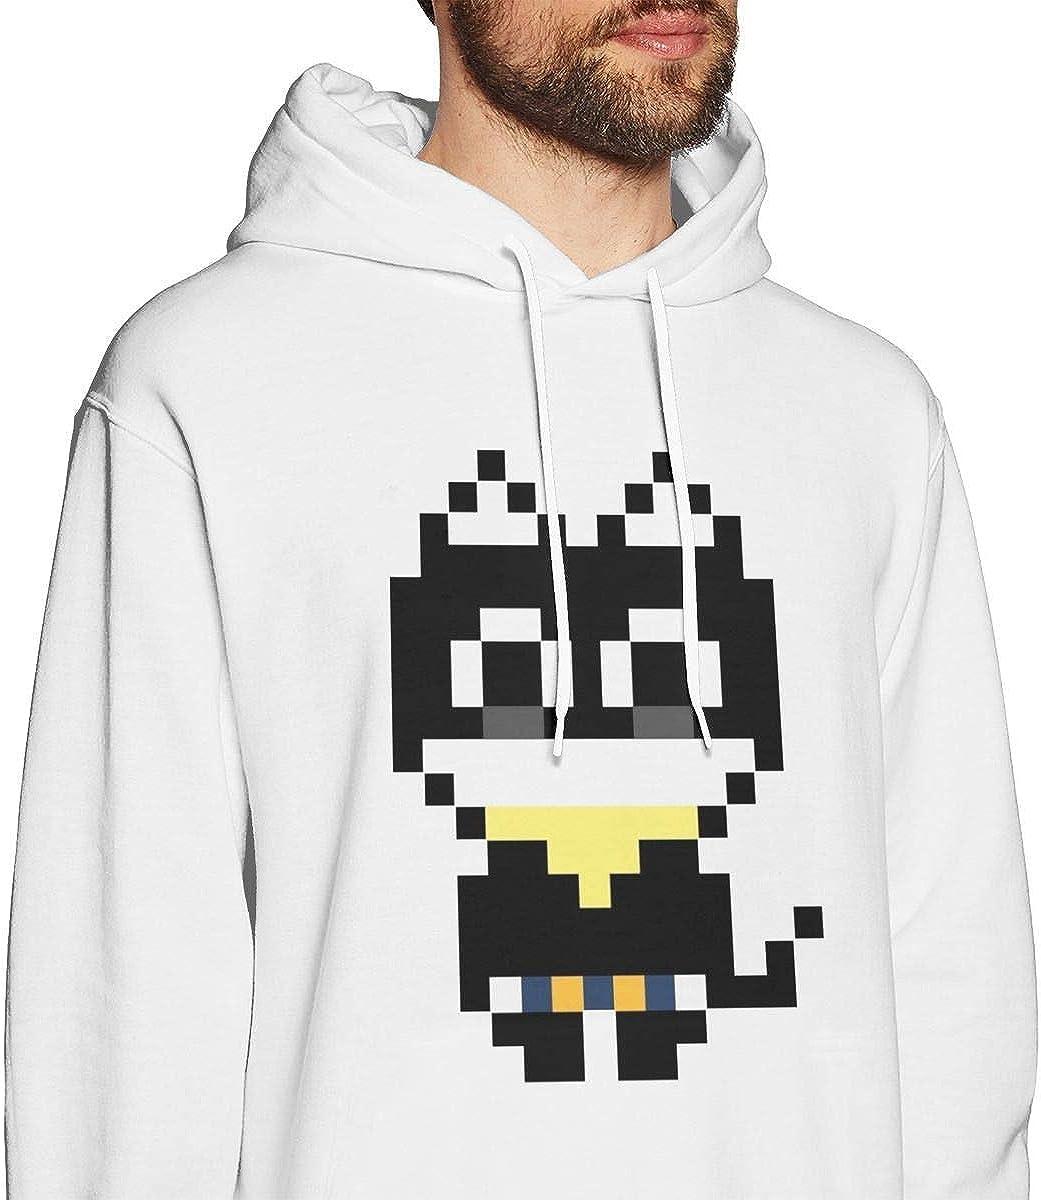 zhkx Persona 5 Phantomdiebe Pixel Art Herren Pullover Hoodies Rundhals-Langarm-Sweatshirt Weiß Xxx-large|style3